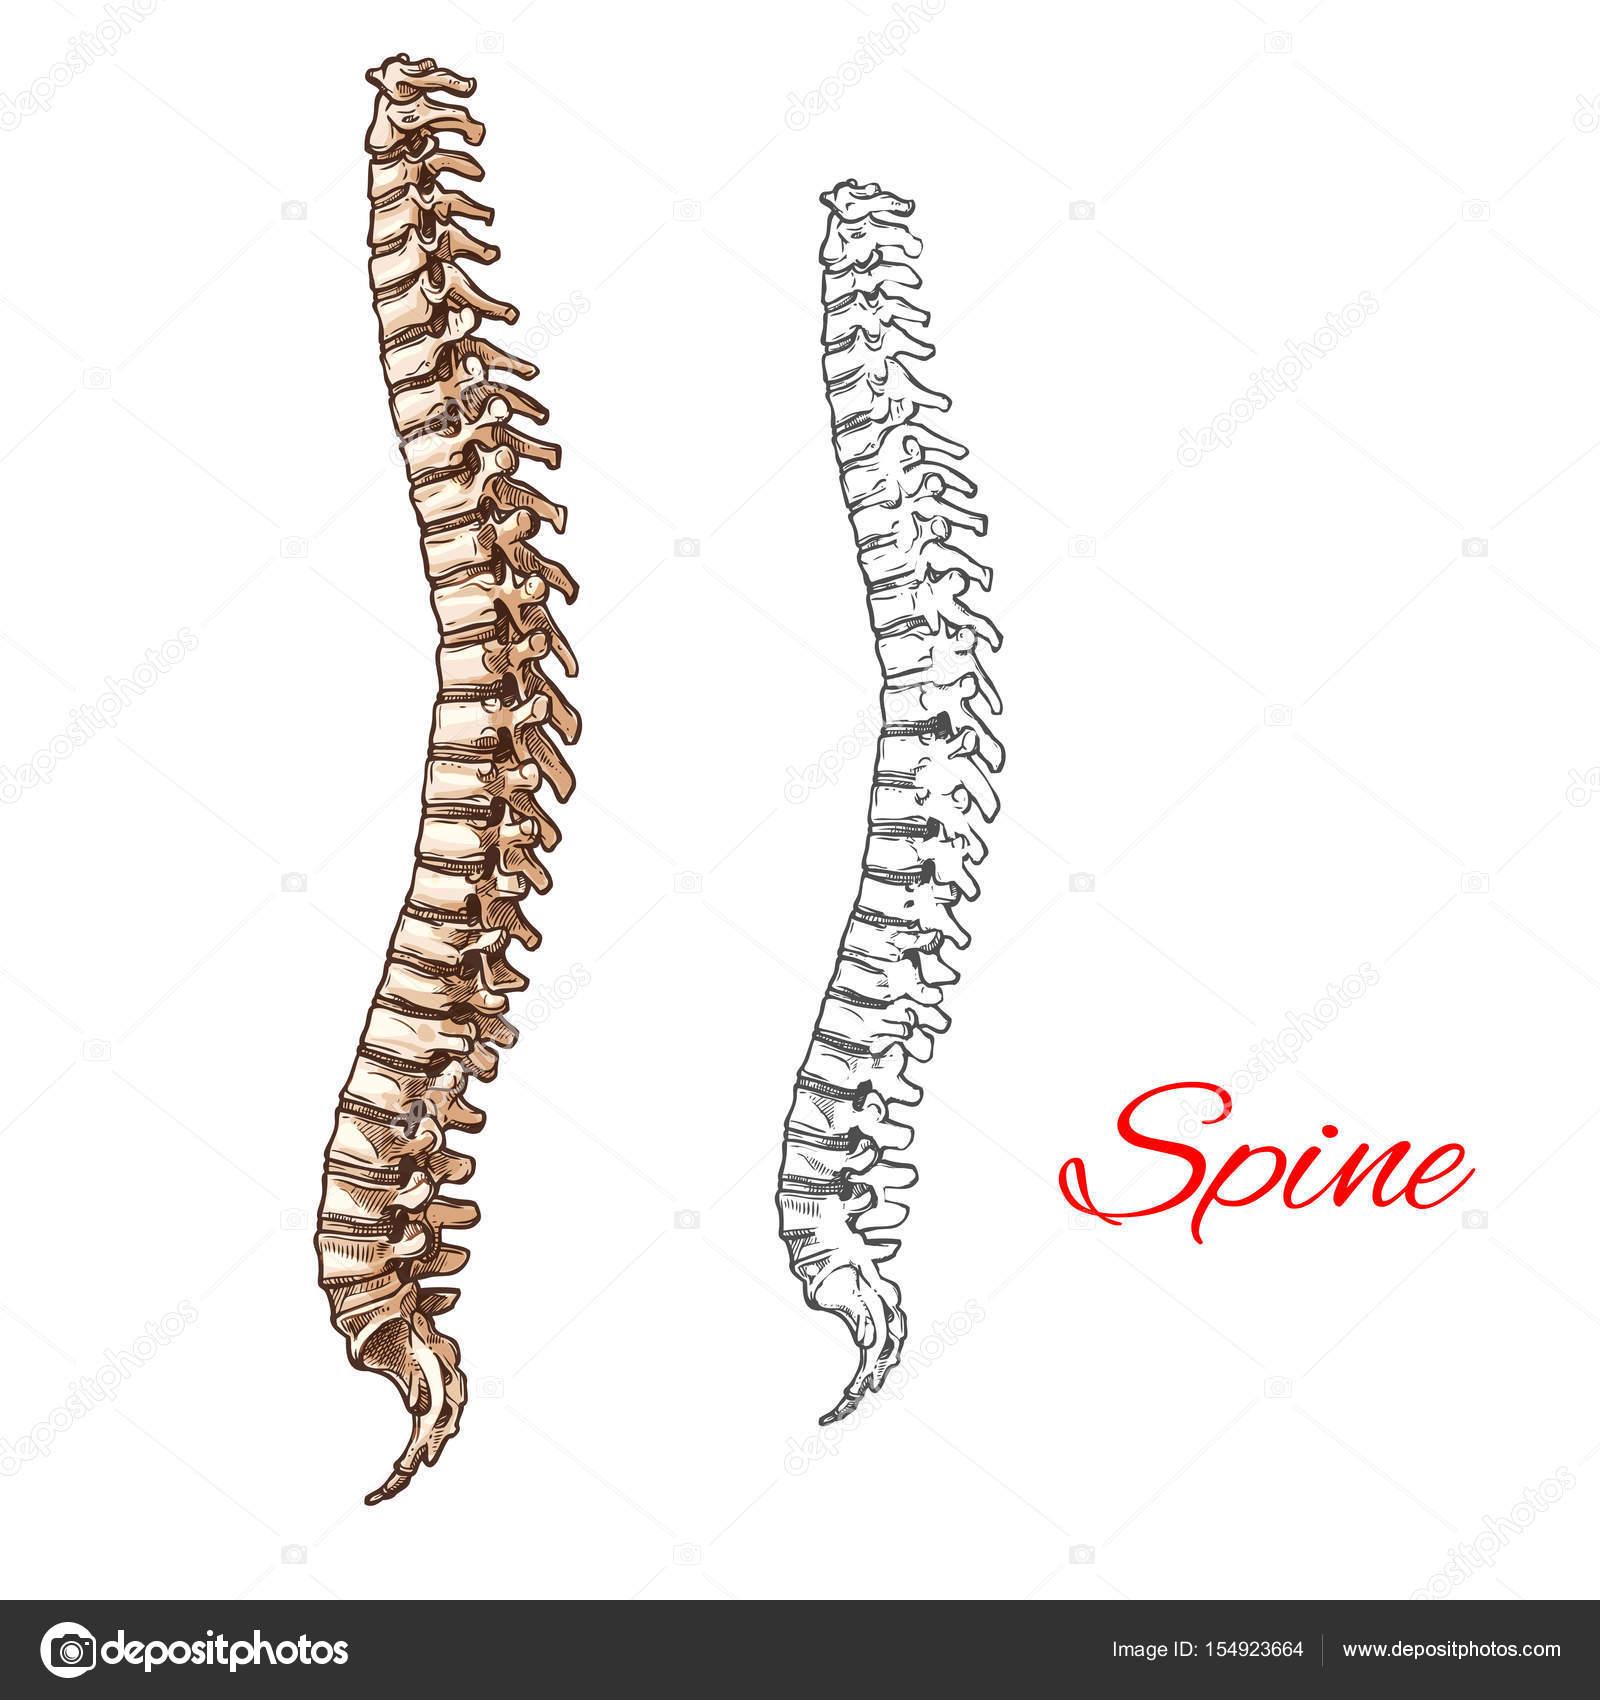 Icono de vector esbozo de espina dorsal humana los huesos o las ...